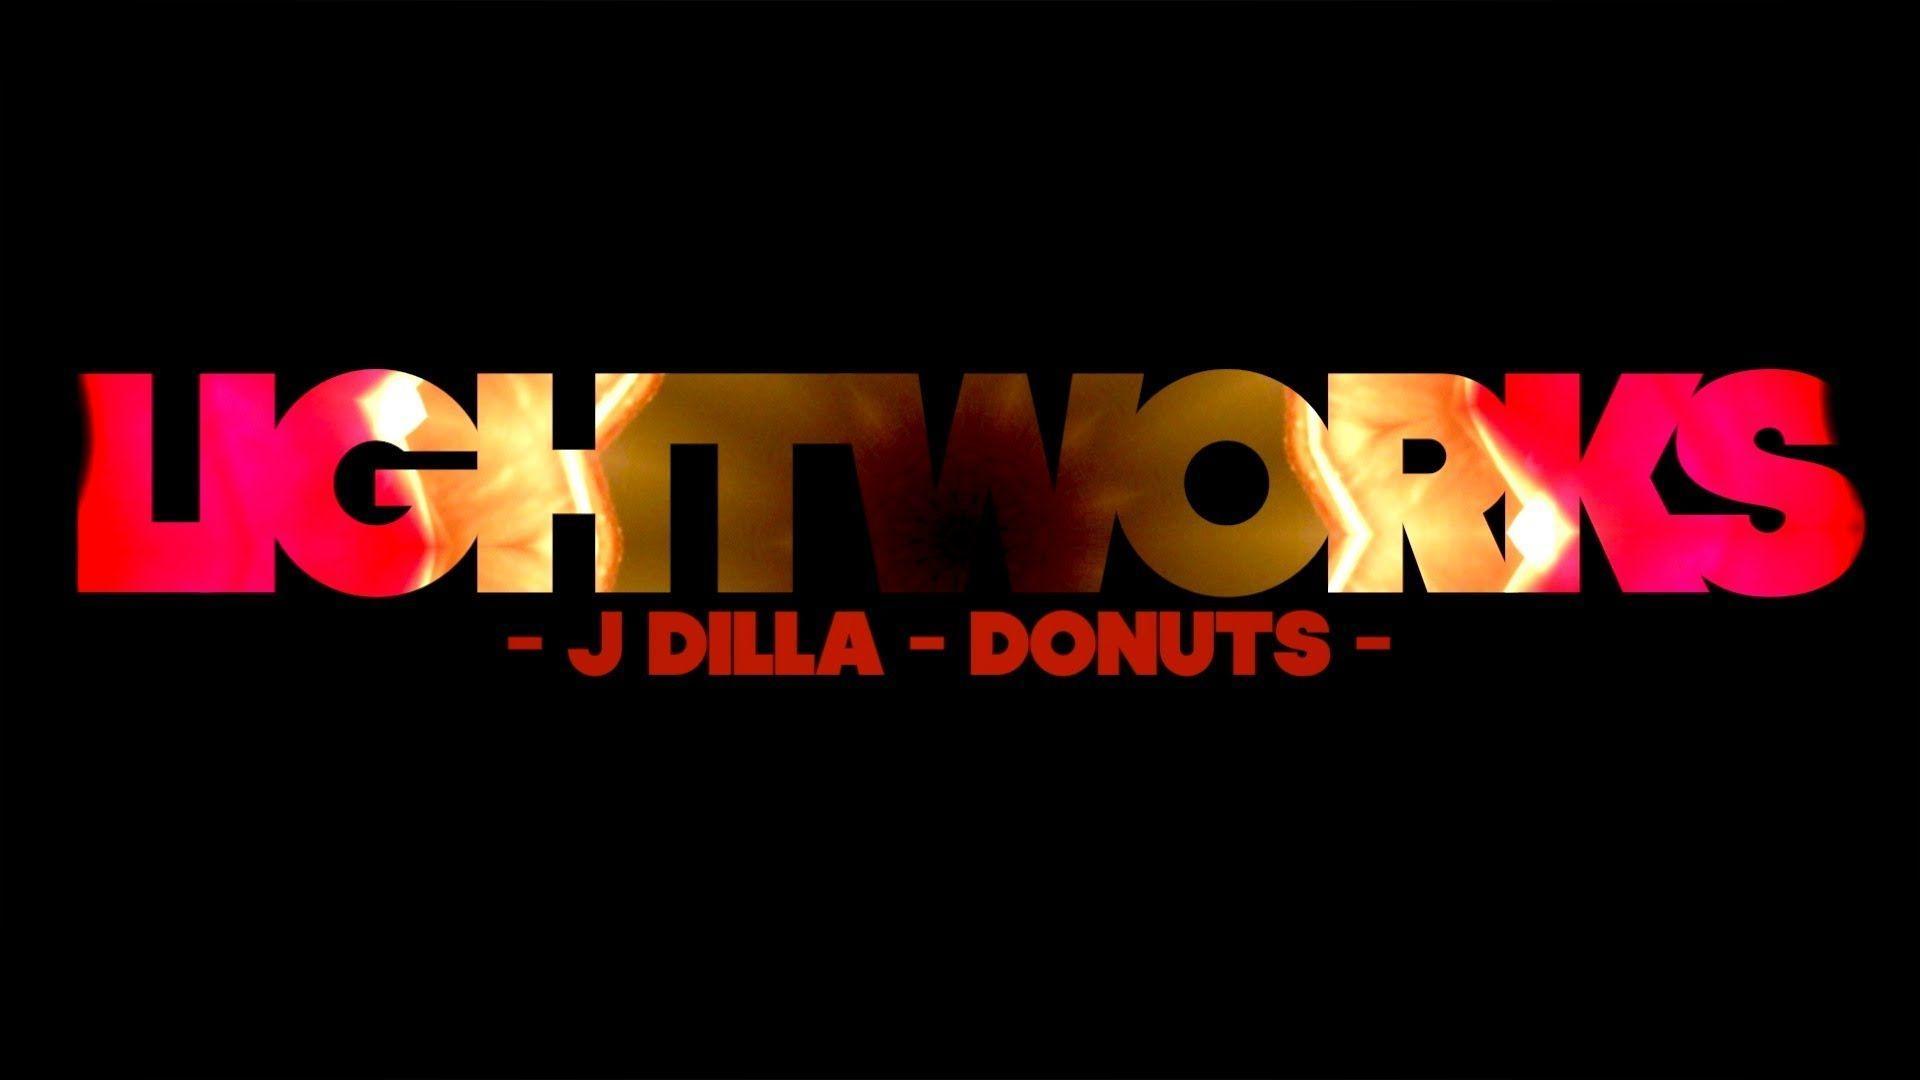 J Dilla Donuts Wallpapers - Top Free J Dilla Donuts